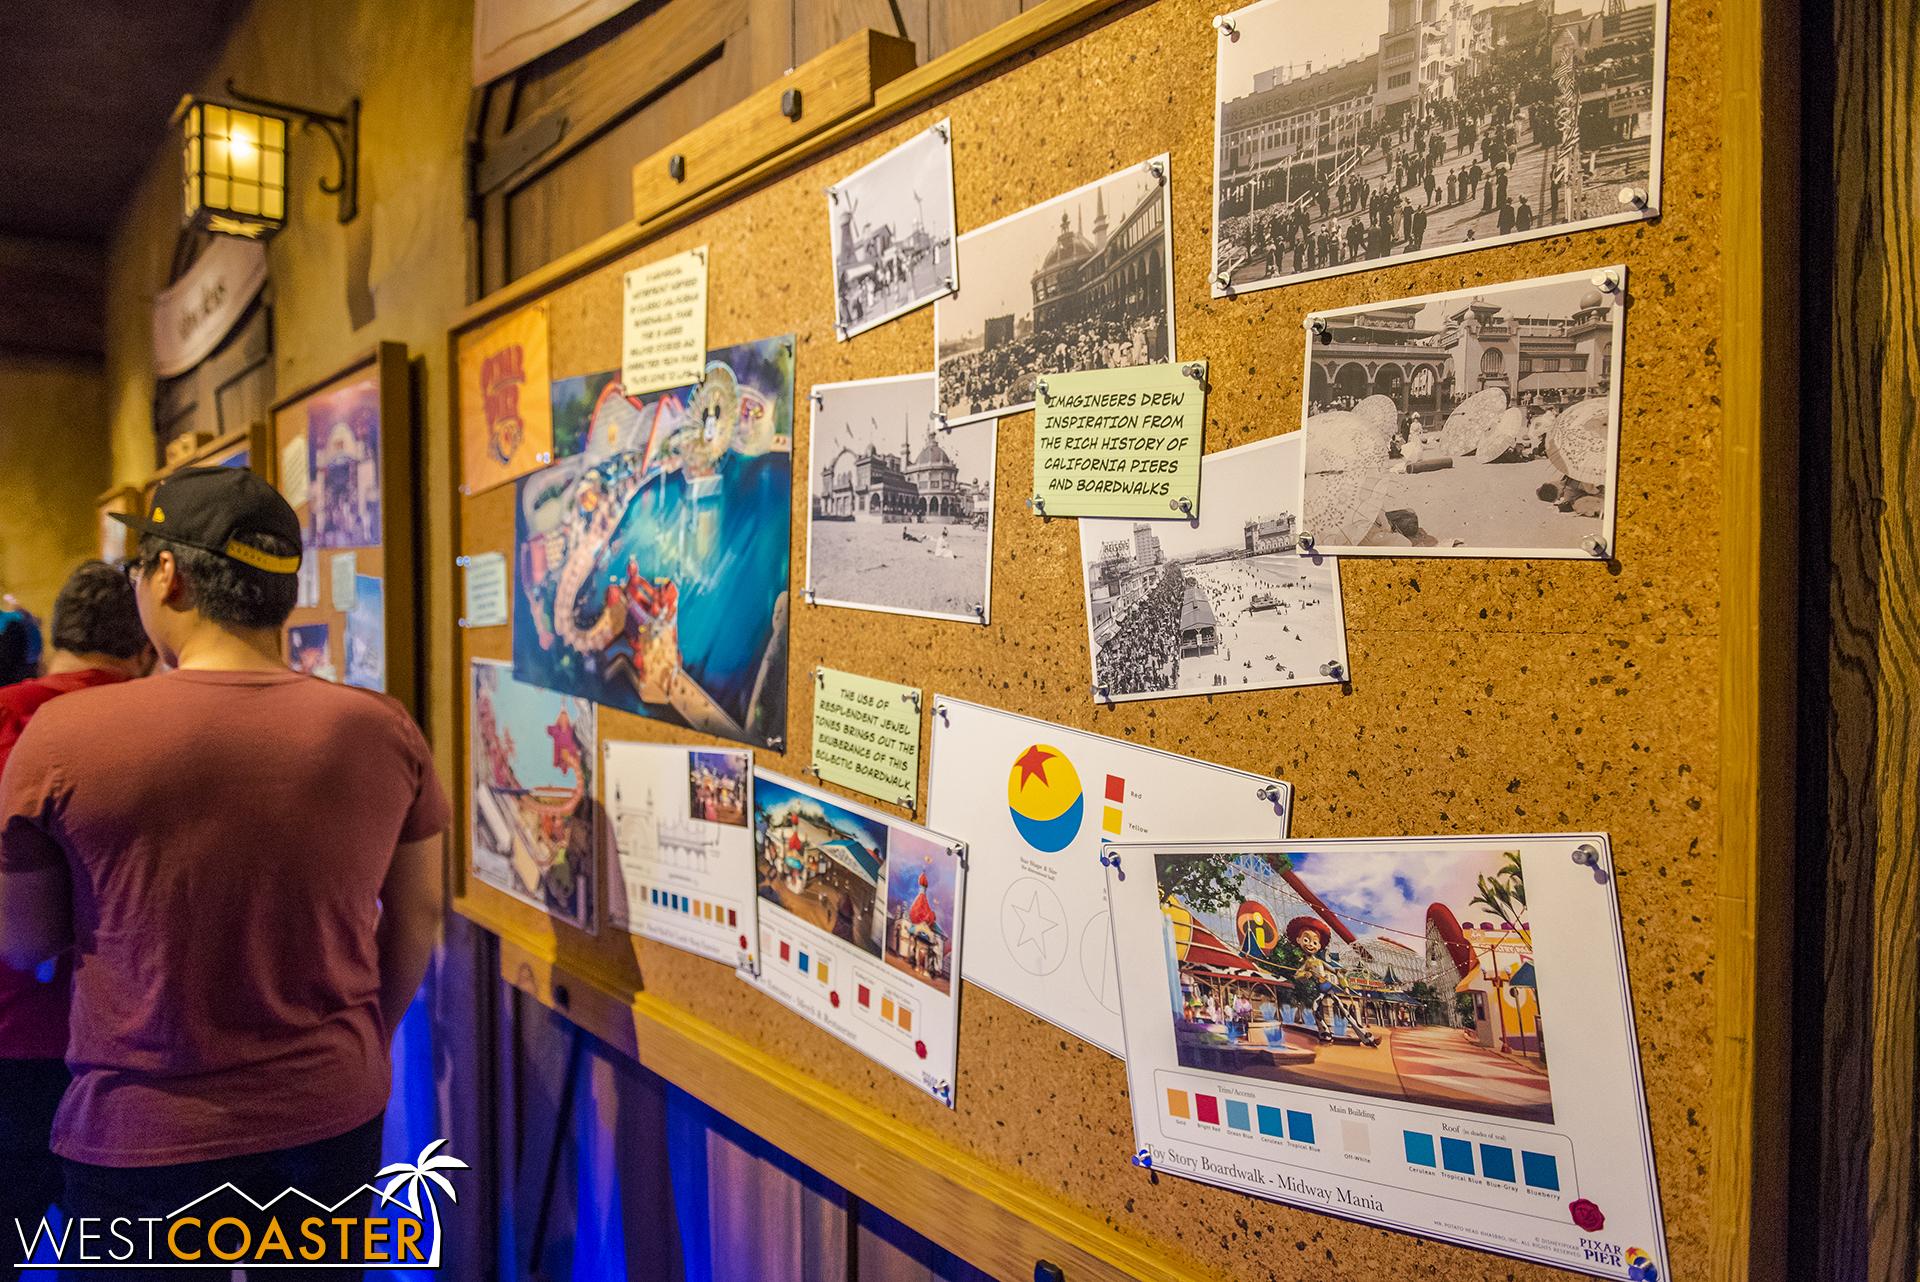 As part of Pixar Fest, the Imagineering sneak peak mini-museum has an exhibit featuring behind the scenes on the design of Pixar Pier.